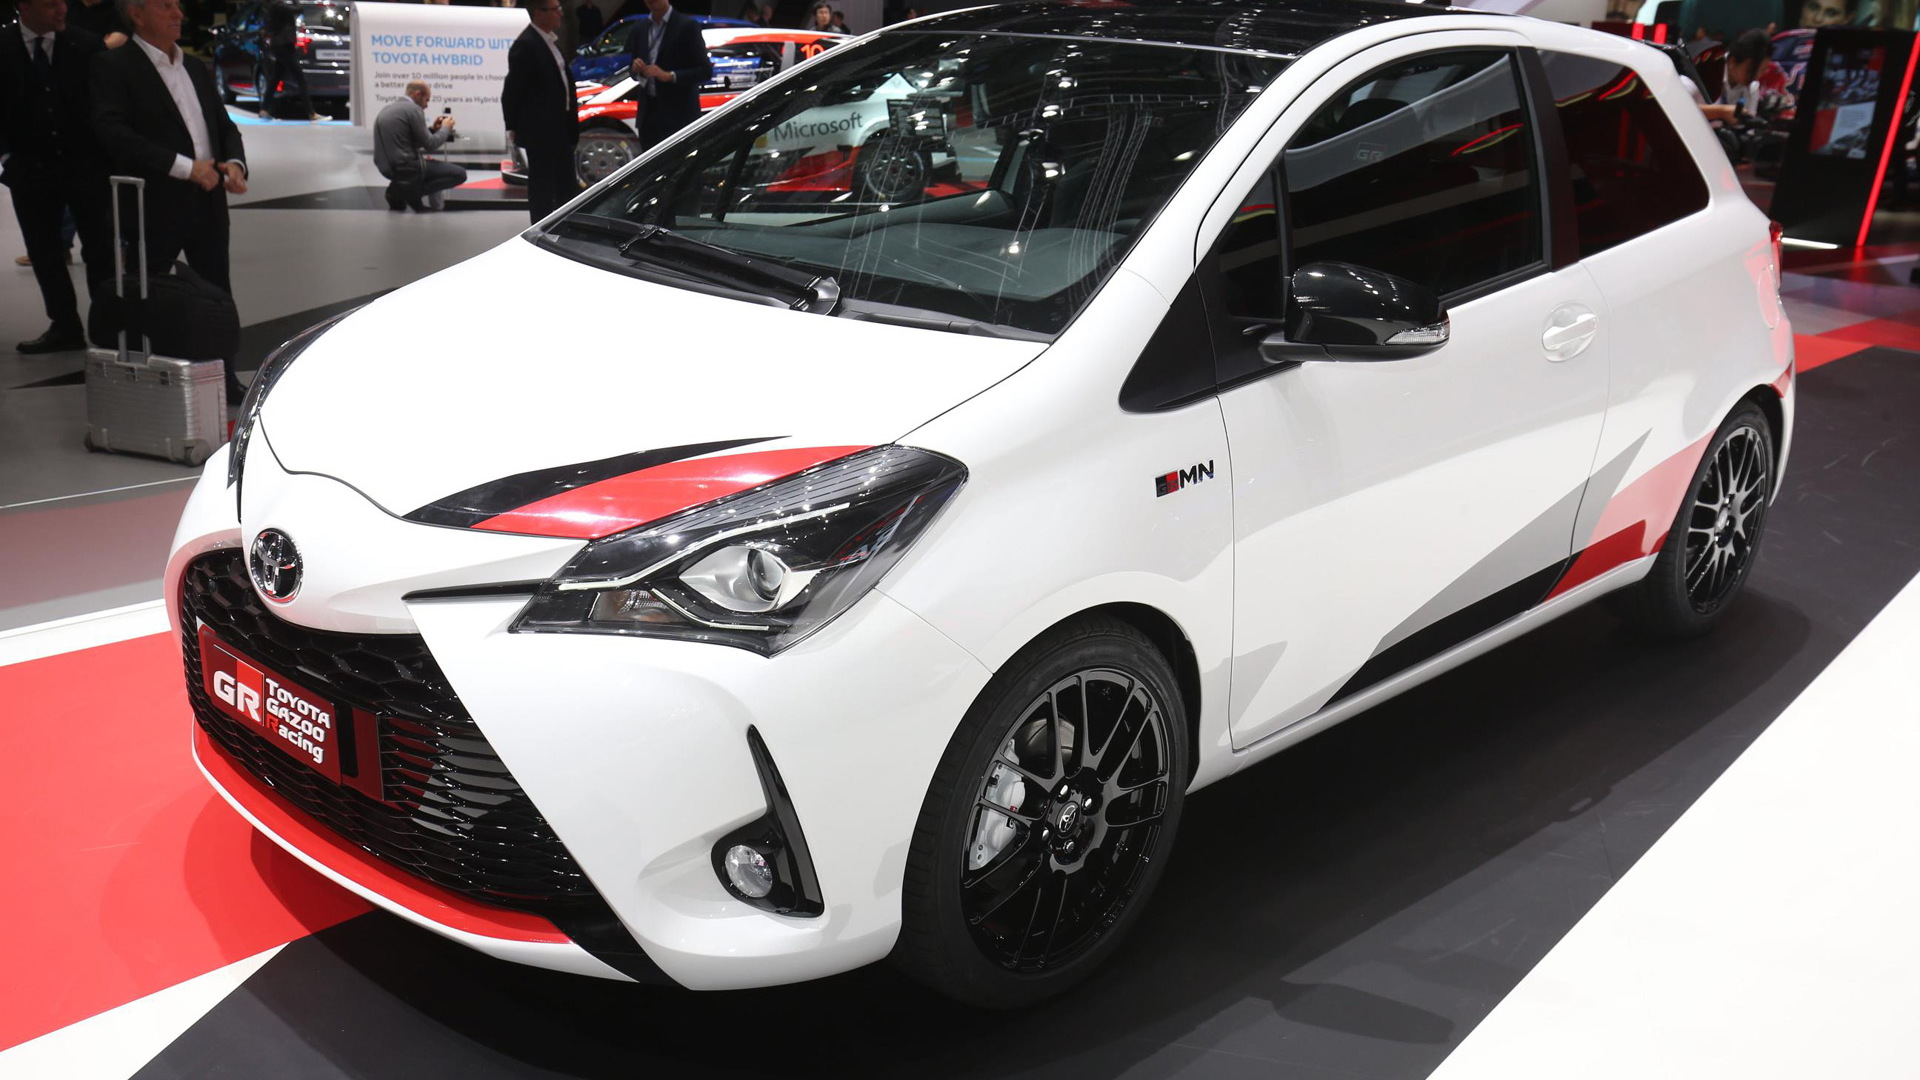 2017 Toyota Yaris GRMN, 2017 Geneva auto show